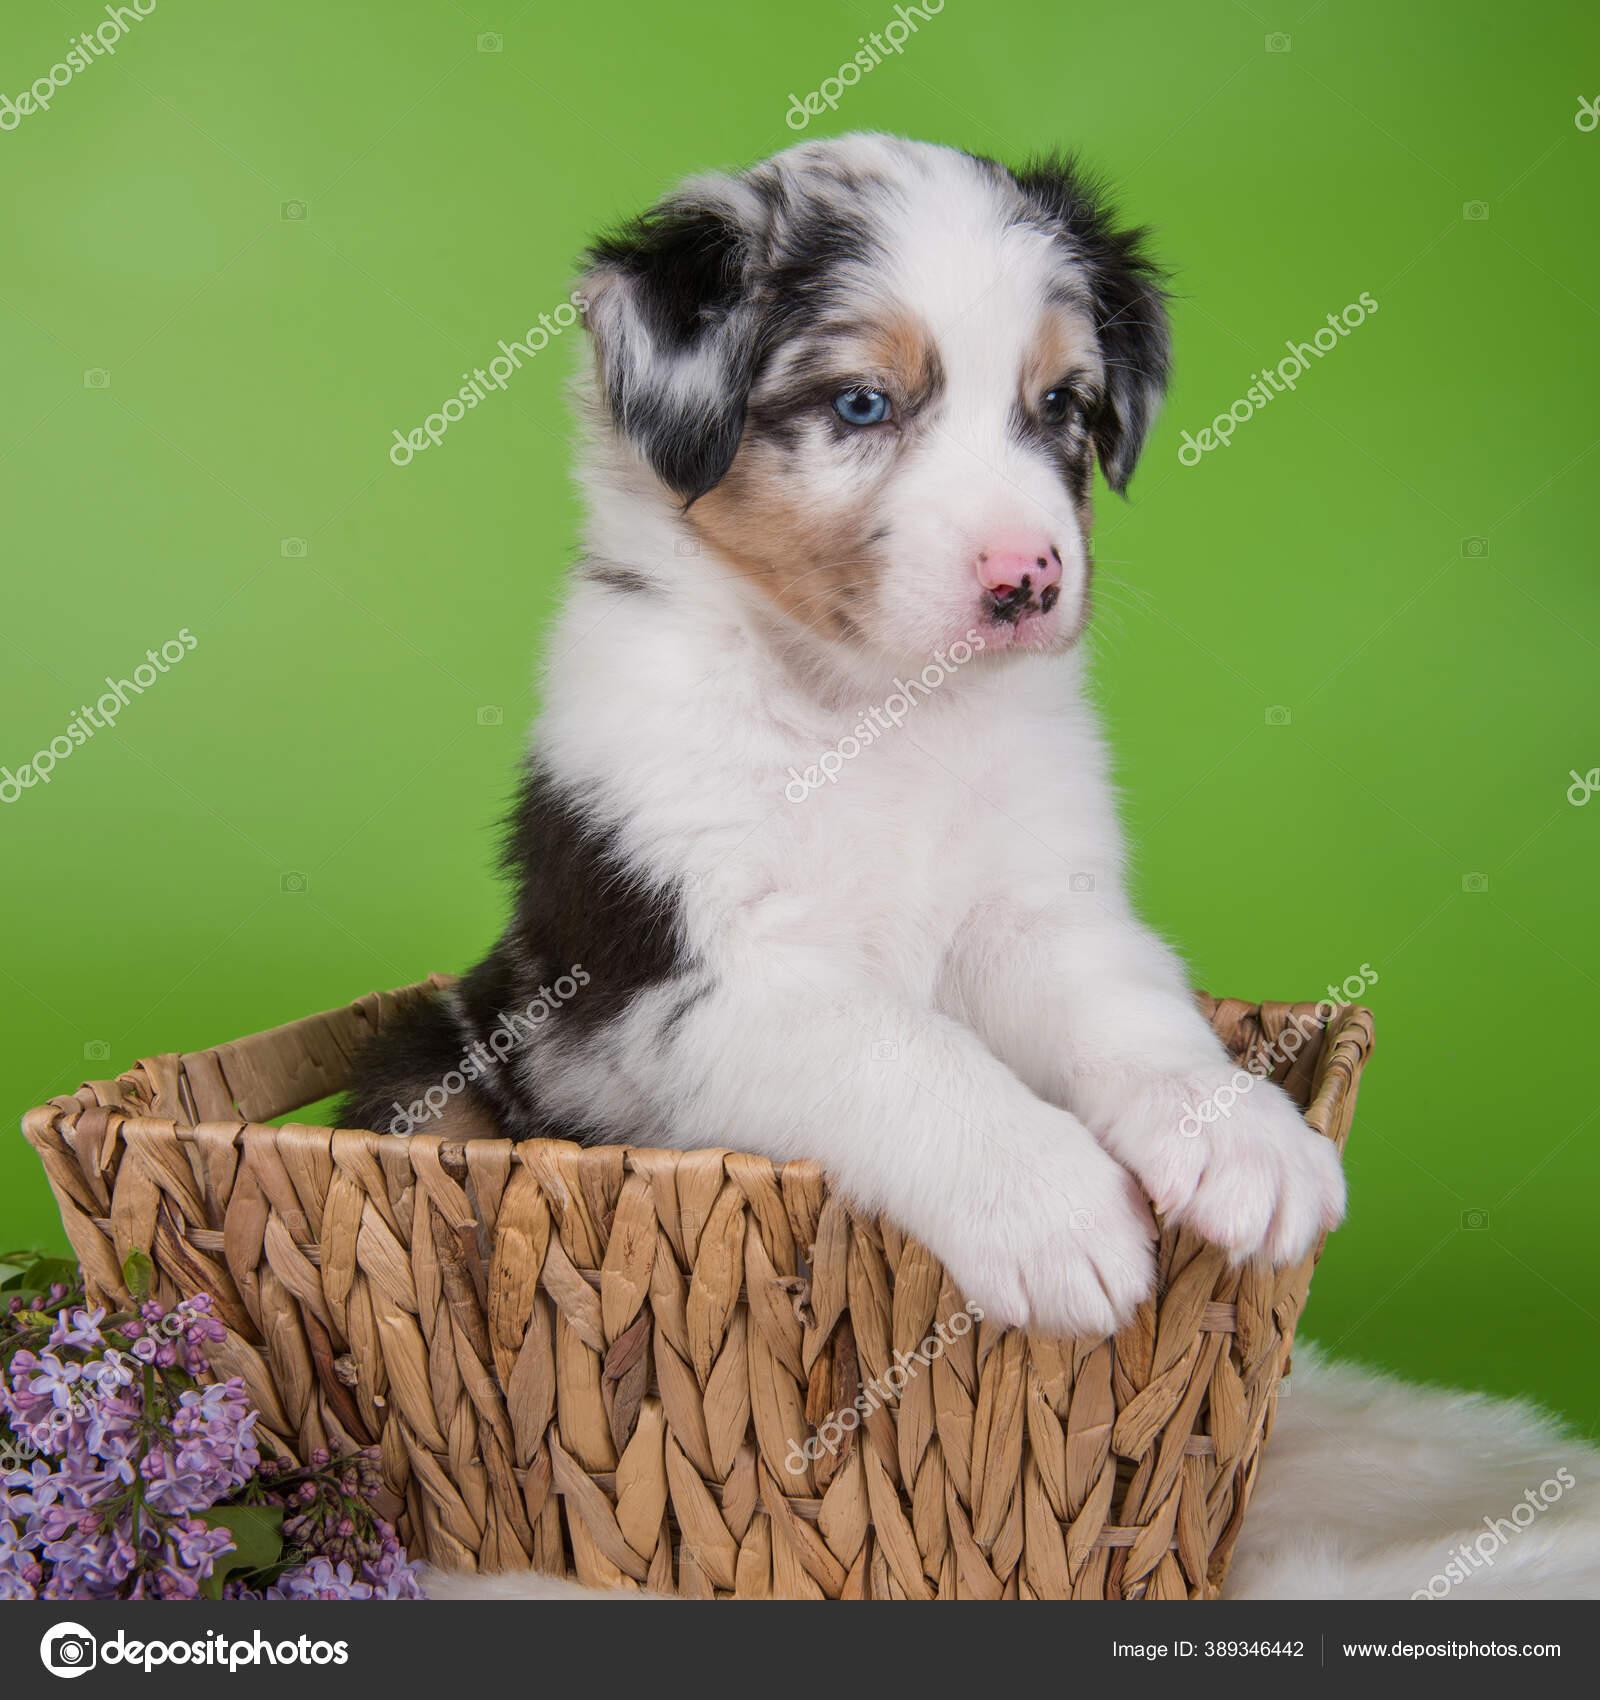 Red Merle Australian Shepherd Puppy Lilac Flowers Stock Photo C Zannaholstova 389346442